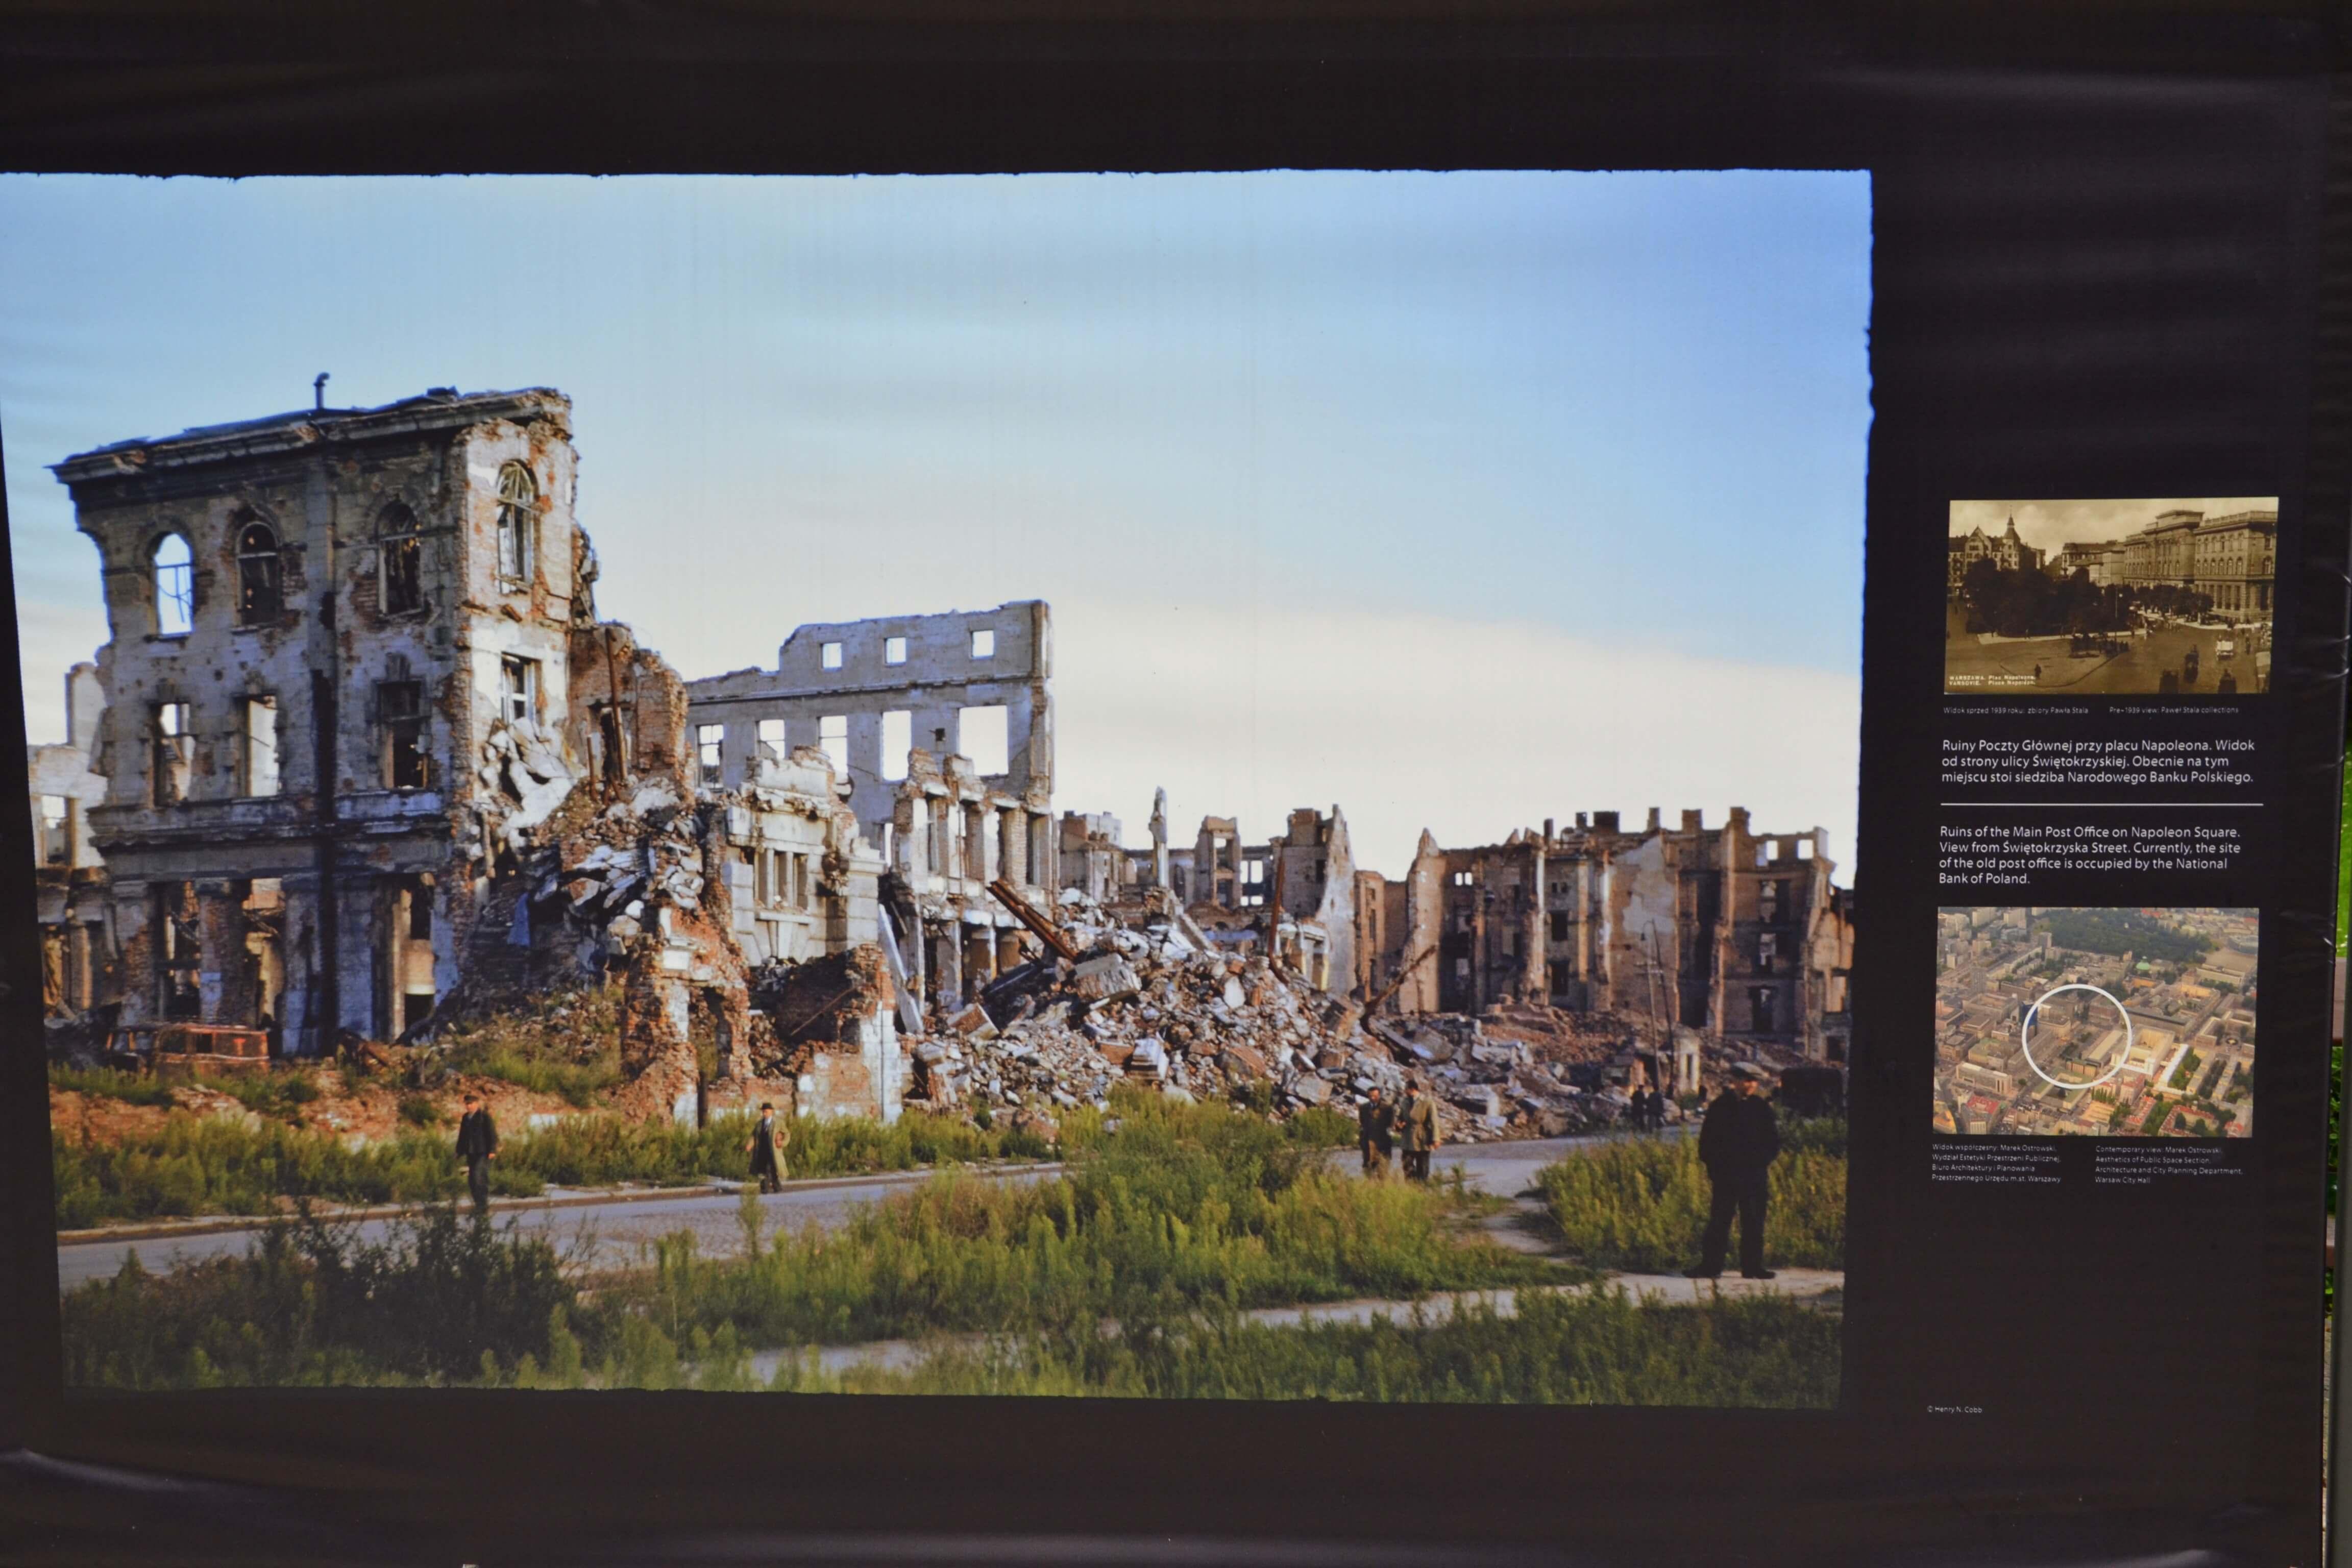 half demolished buildings with people standing looking